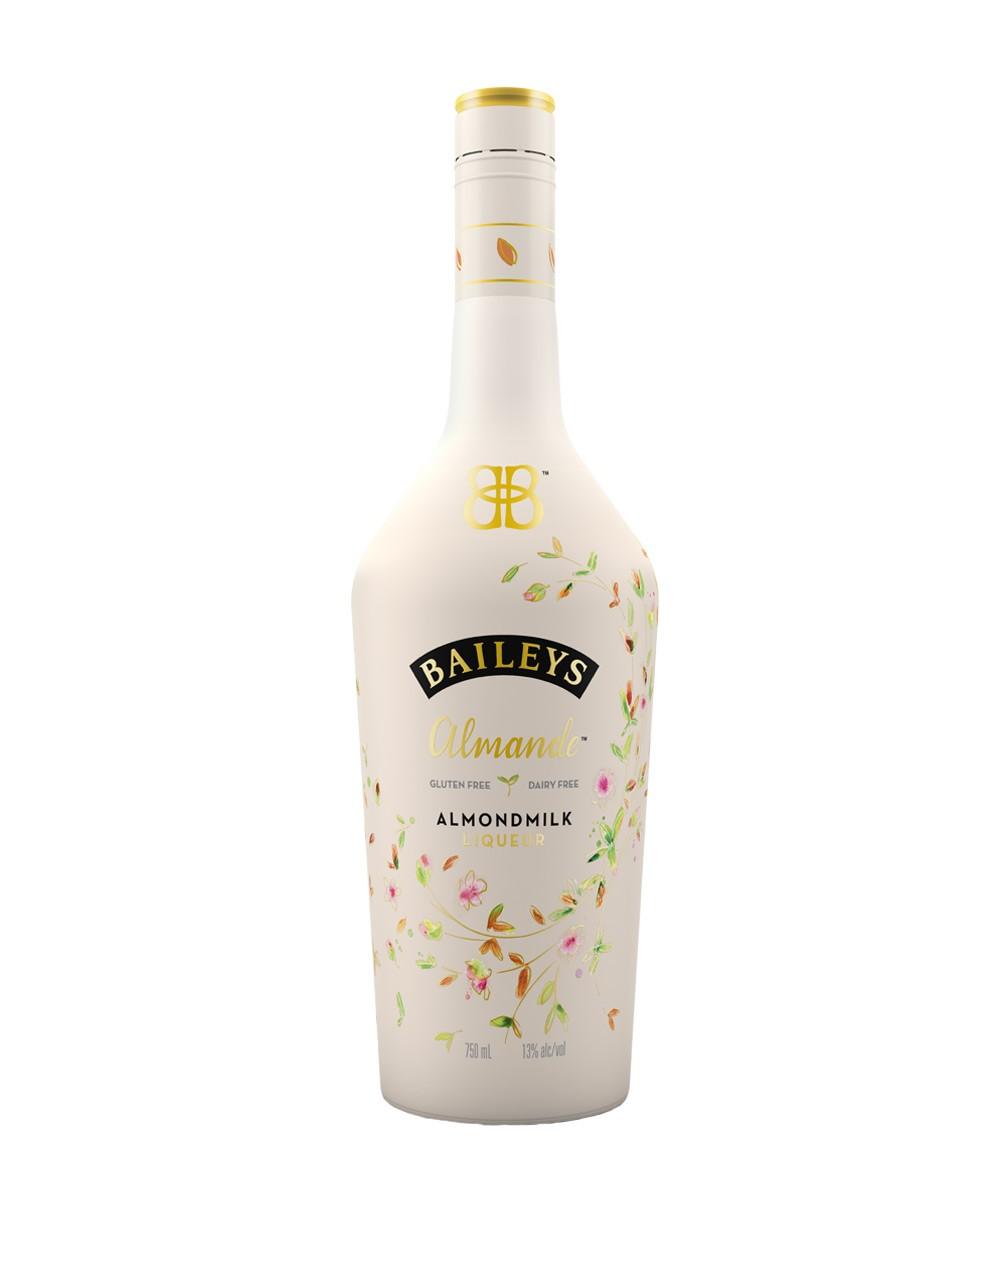 Baileys Almande Liqueur  Buy Online or Send as a Gift